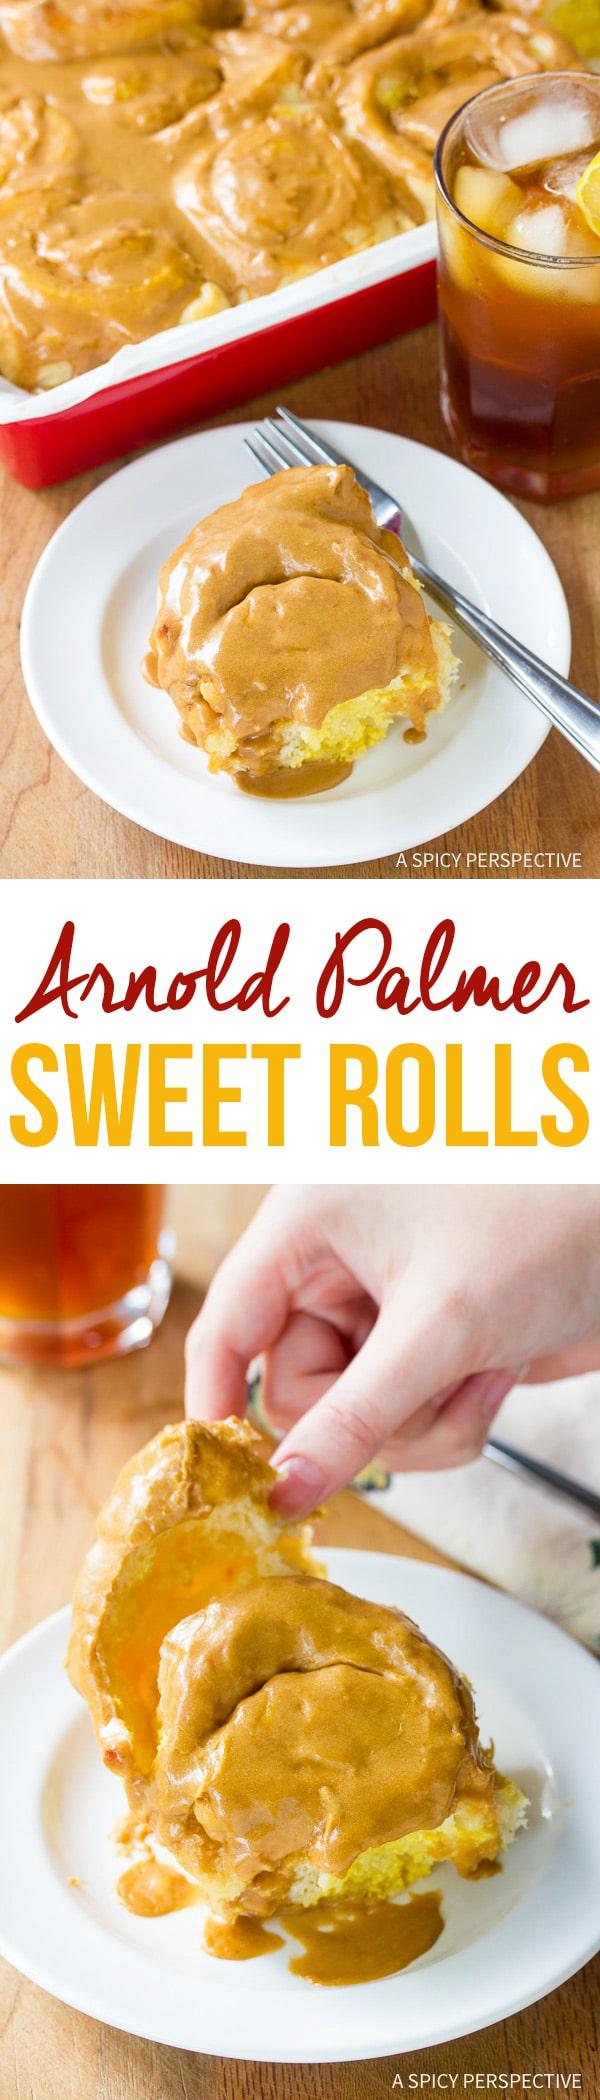 Amazing Arnold Palmer Sweet Rolls Recipe